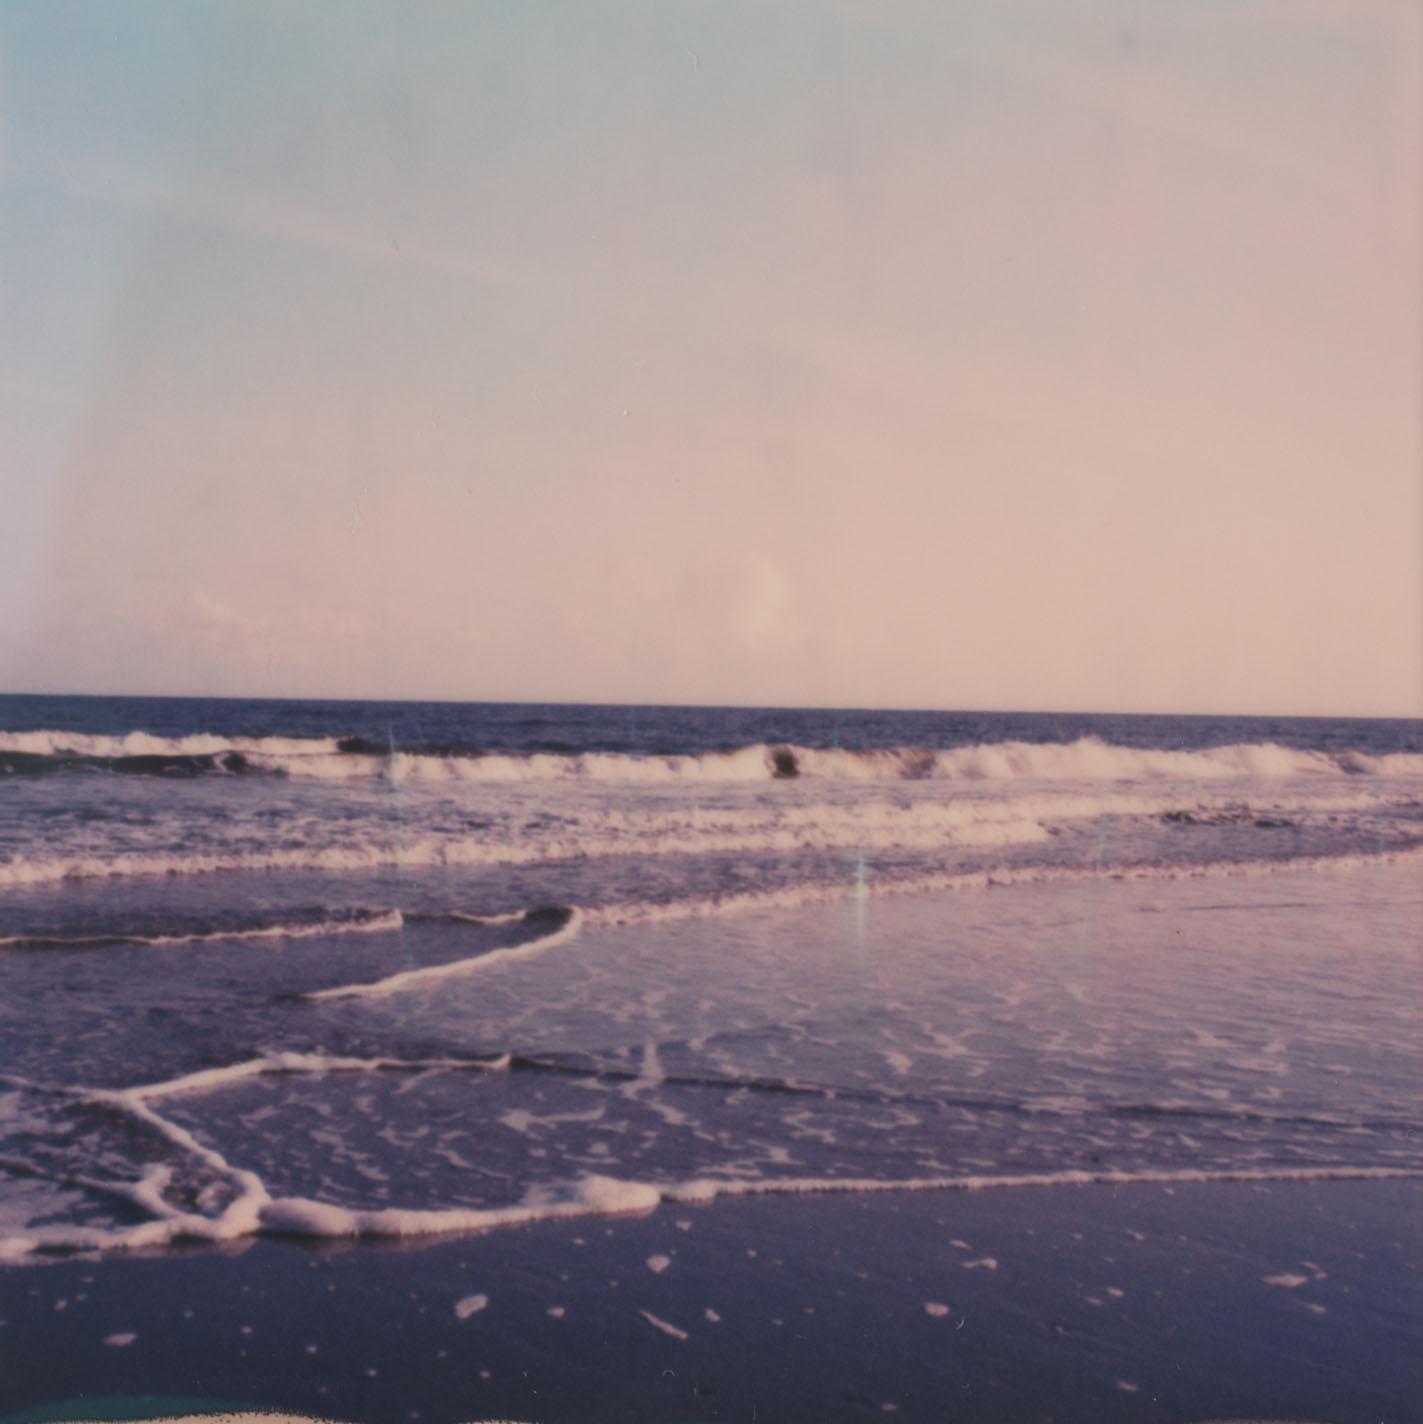 20181015_OceanView-016_square.jpg